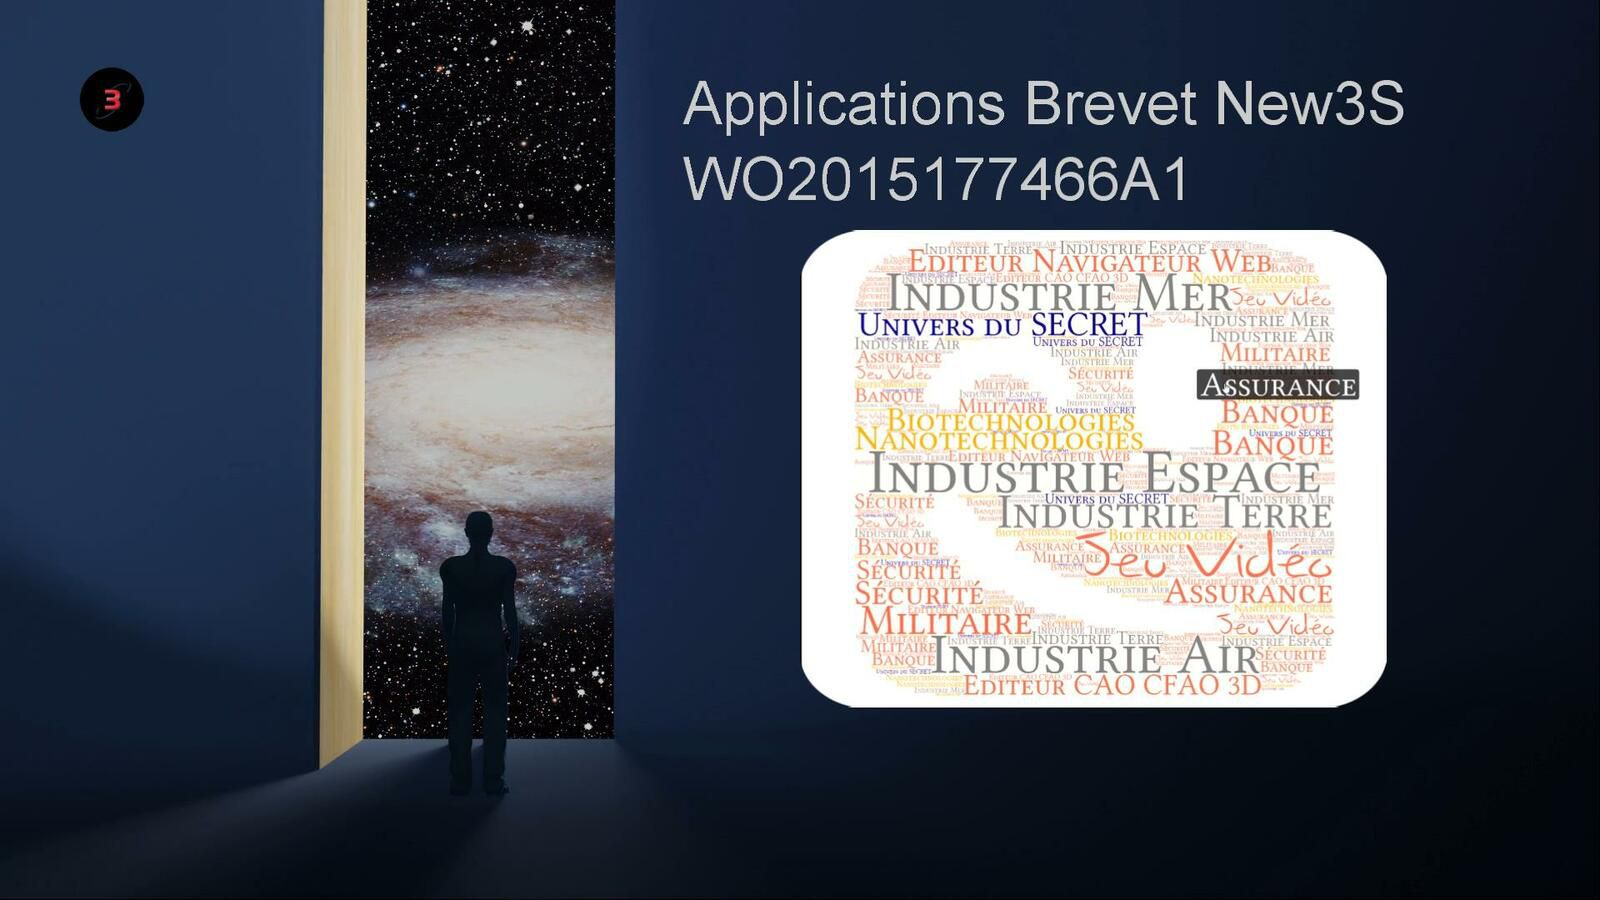 Parmi les Applications du brevet WO2015177466A1 New3S Herve Heully